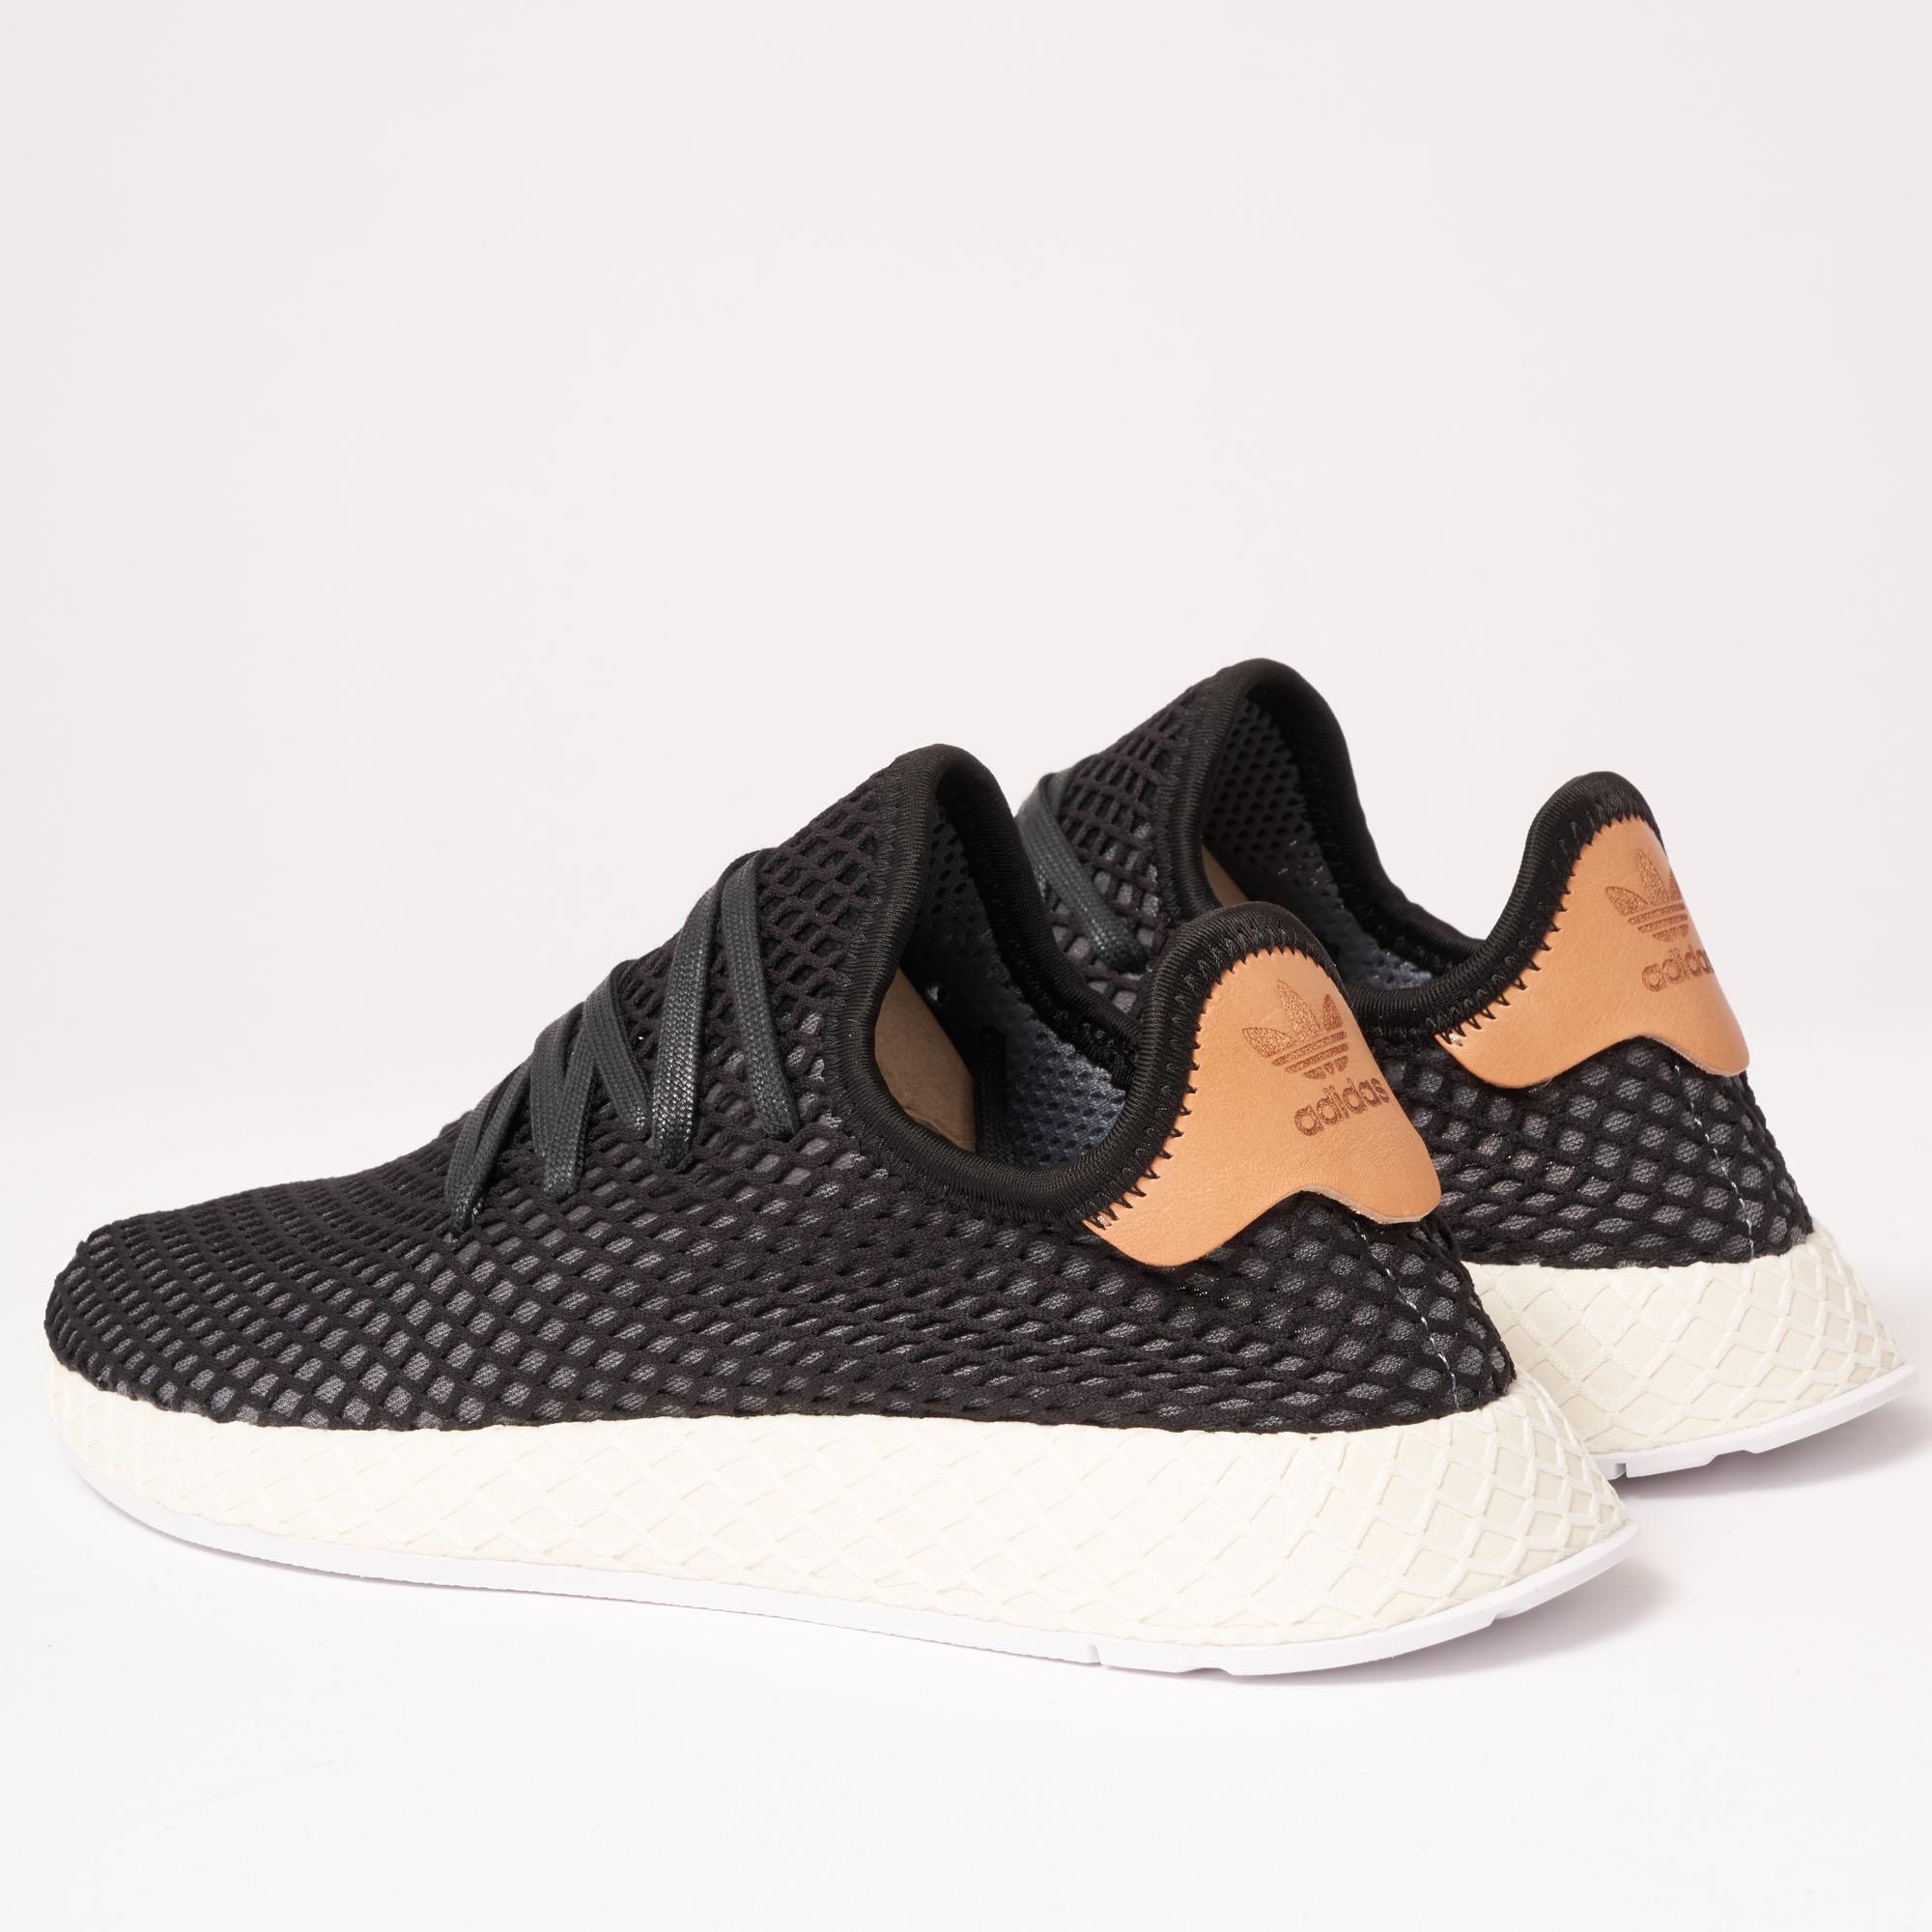 100% authentic 0b2a1 c0db9 Adidas Originals - Deerupt Runner - Core Black  Ash Pearl for Men - Lyst.  View fullscreen